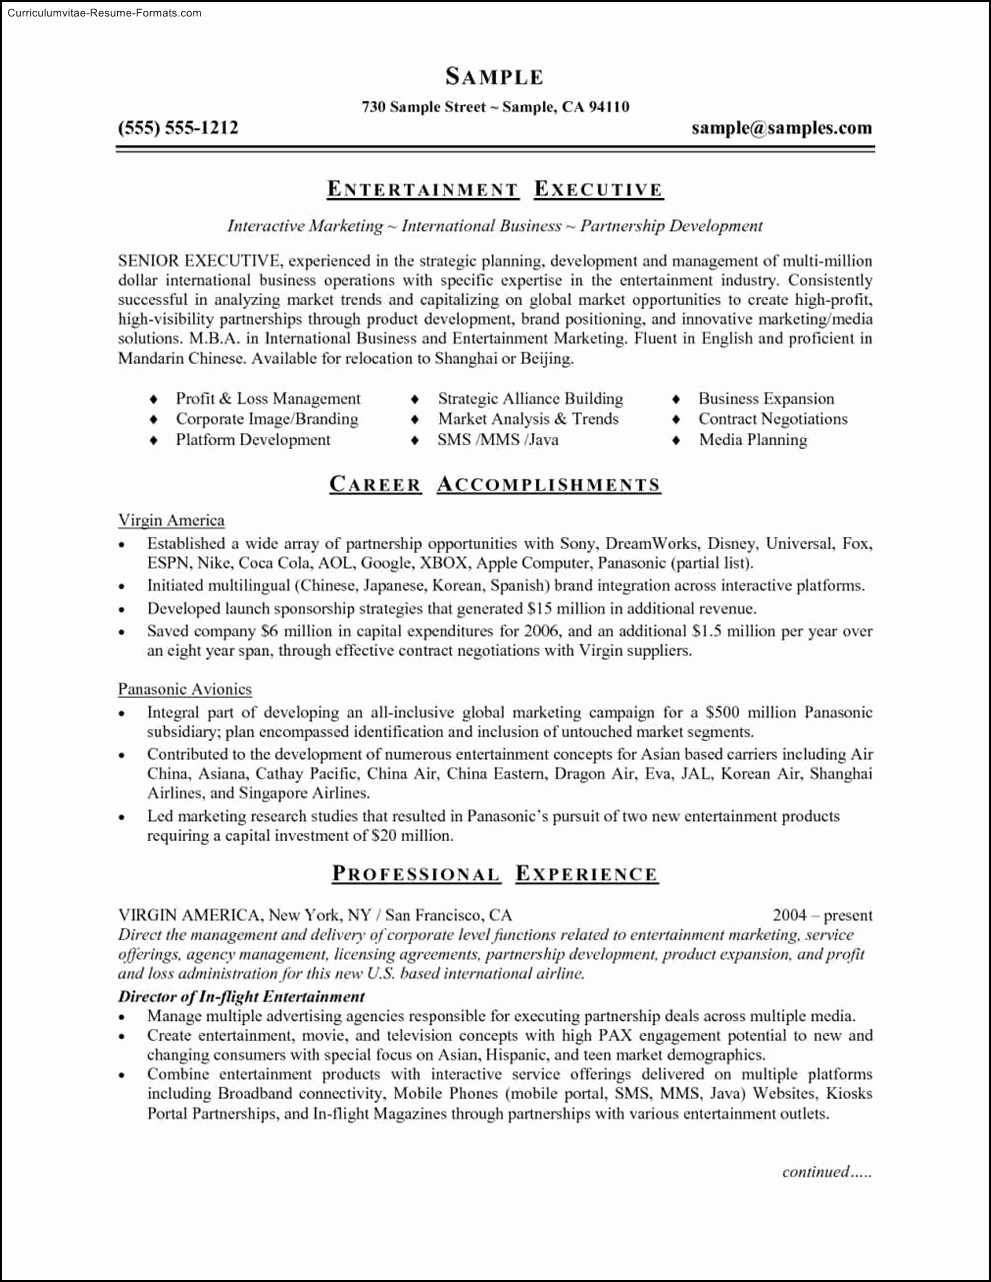 Resume Templates Download Microsoft Word Lovely Microsoft Word 2003 Resume Template Free Download Free